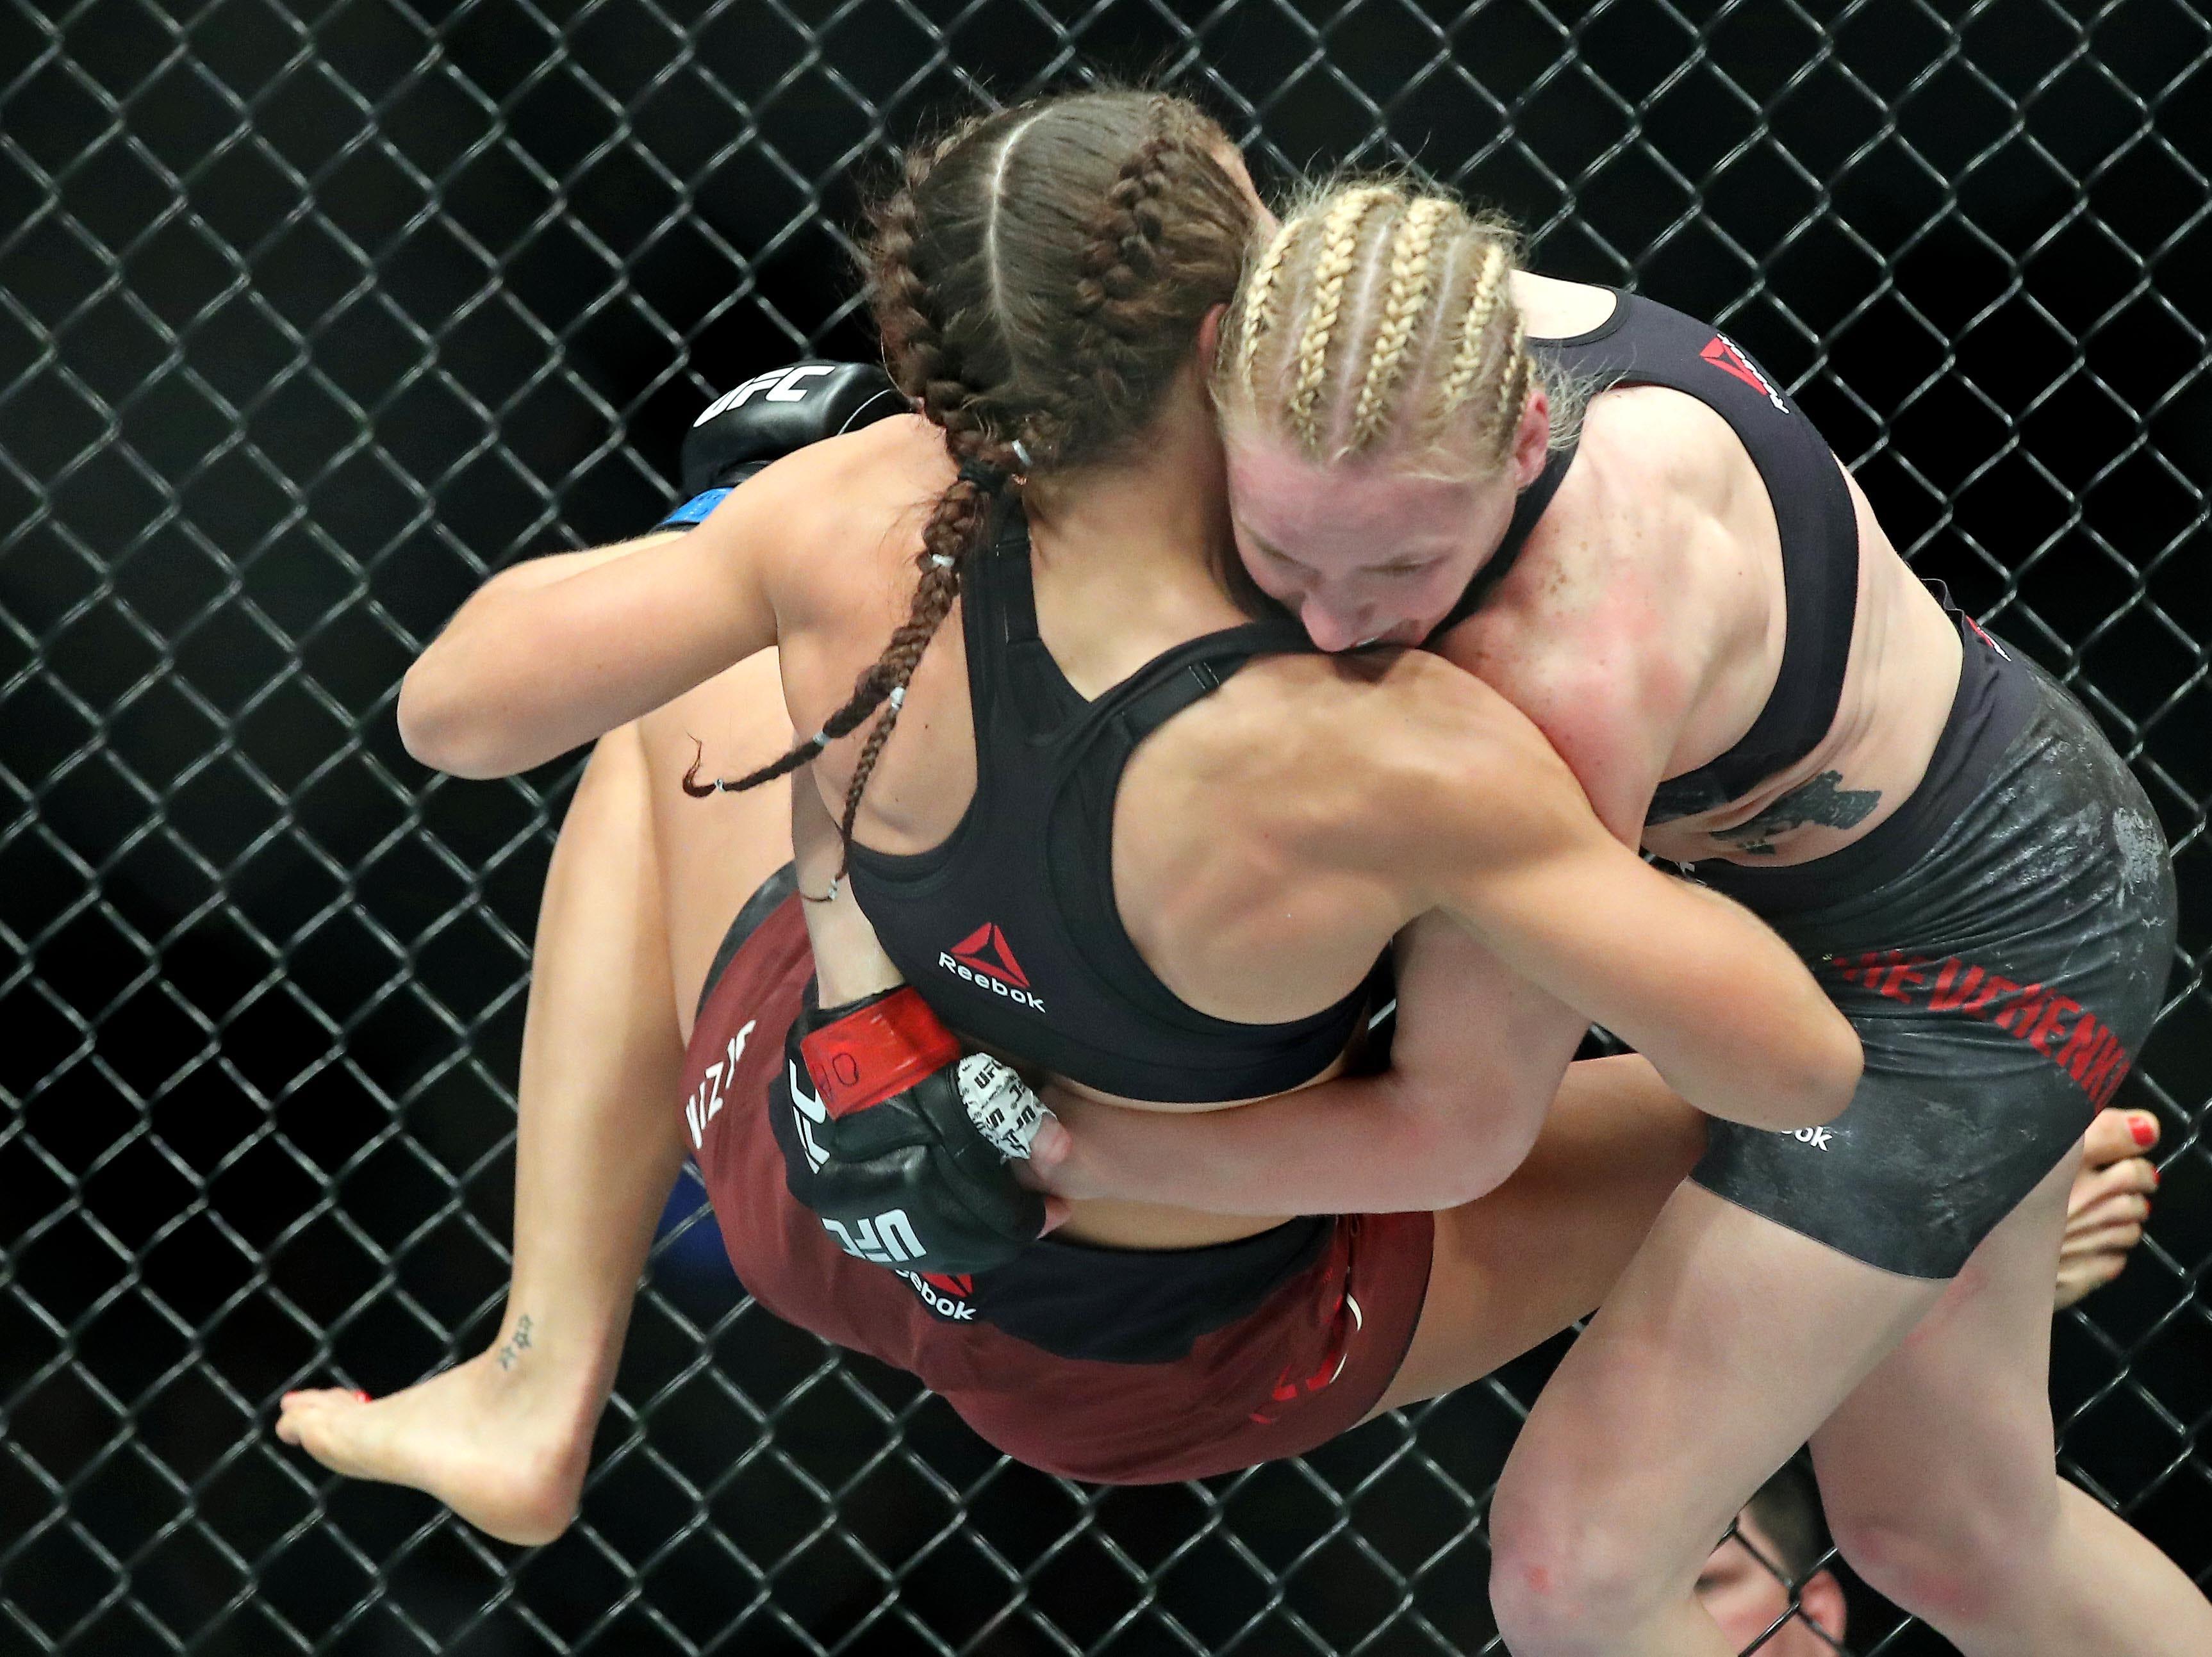 Valentina Shevchenko (red gloves) fights Joanna Jedrzejczyk (blue gloves) during UFC 231 at Scotiabank Arena.